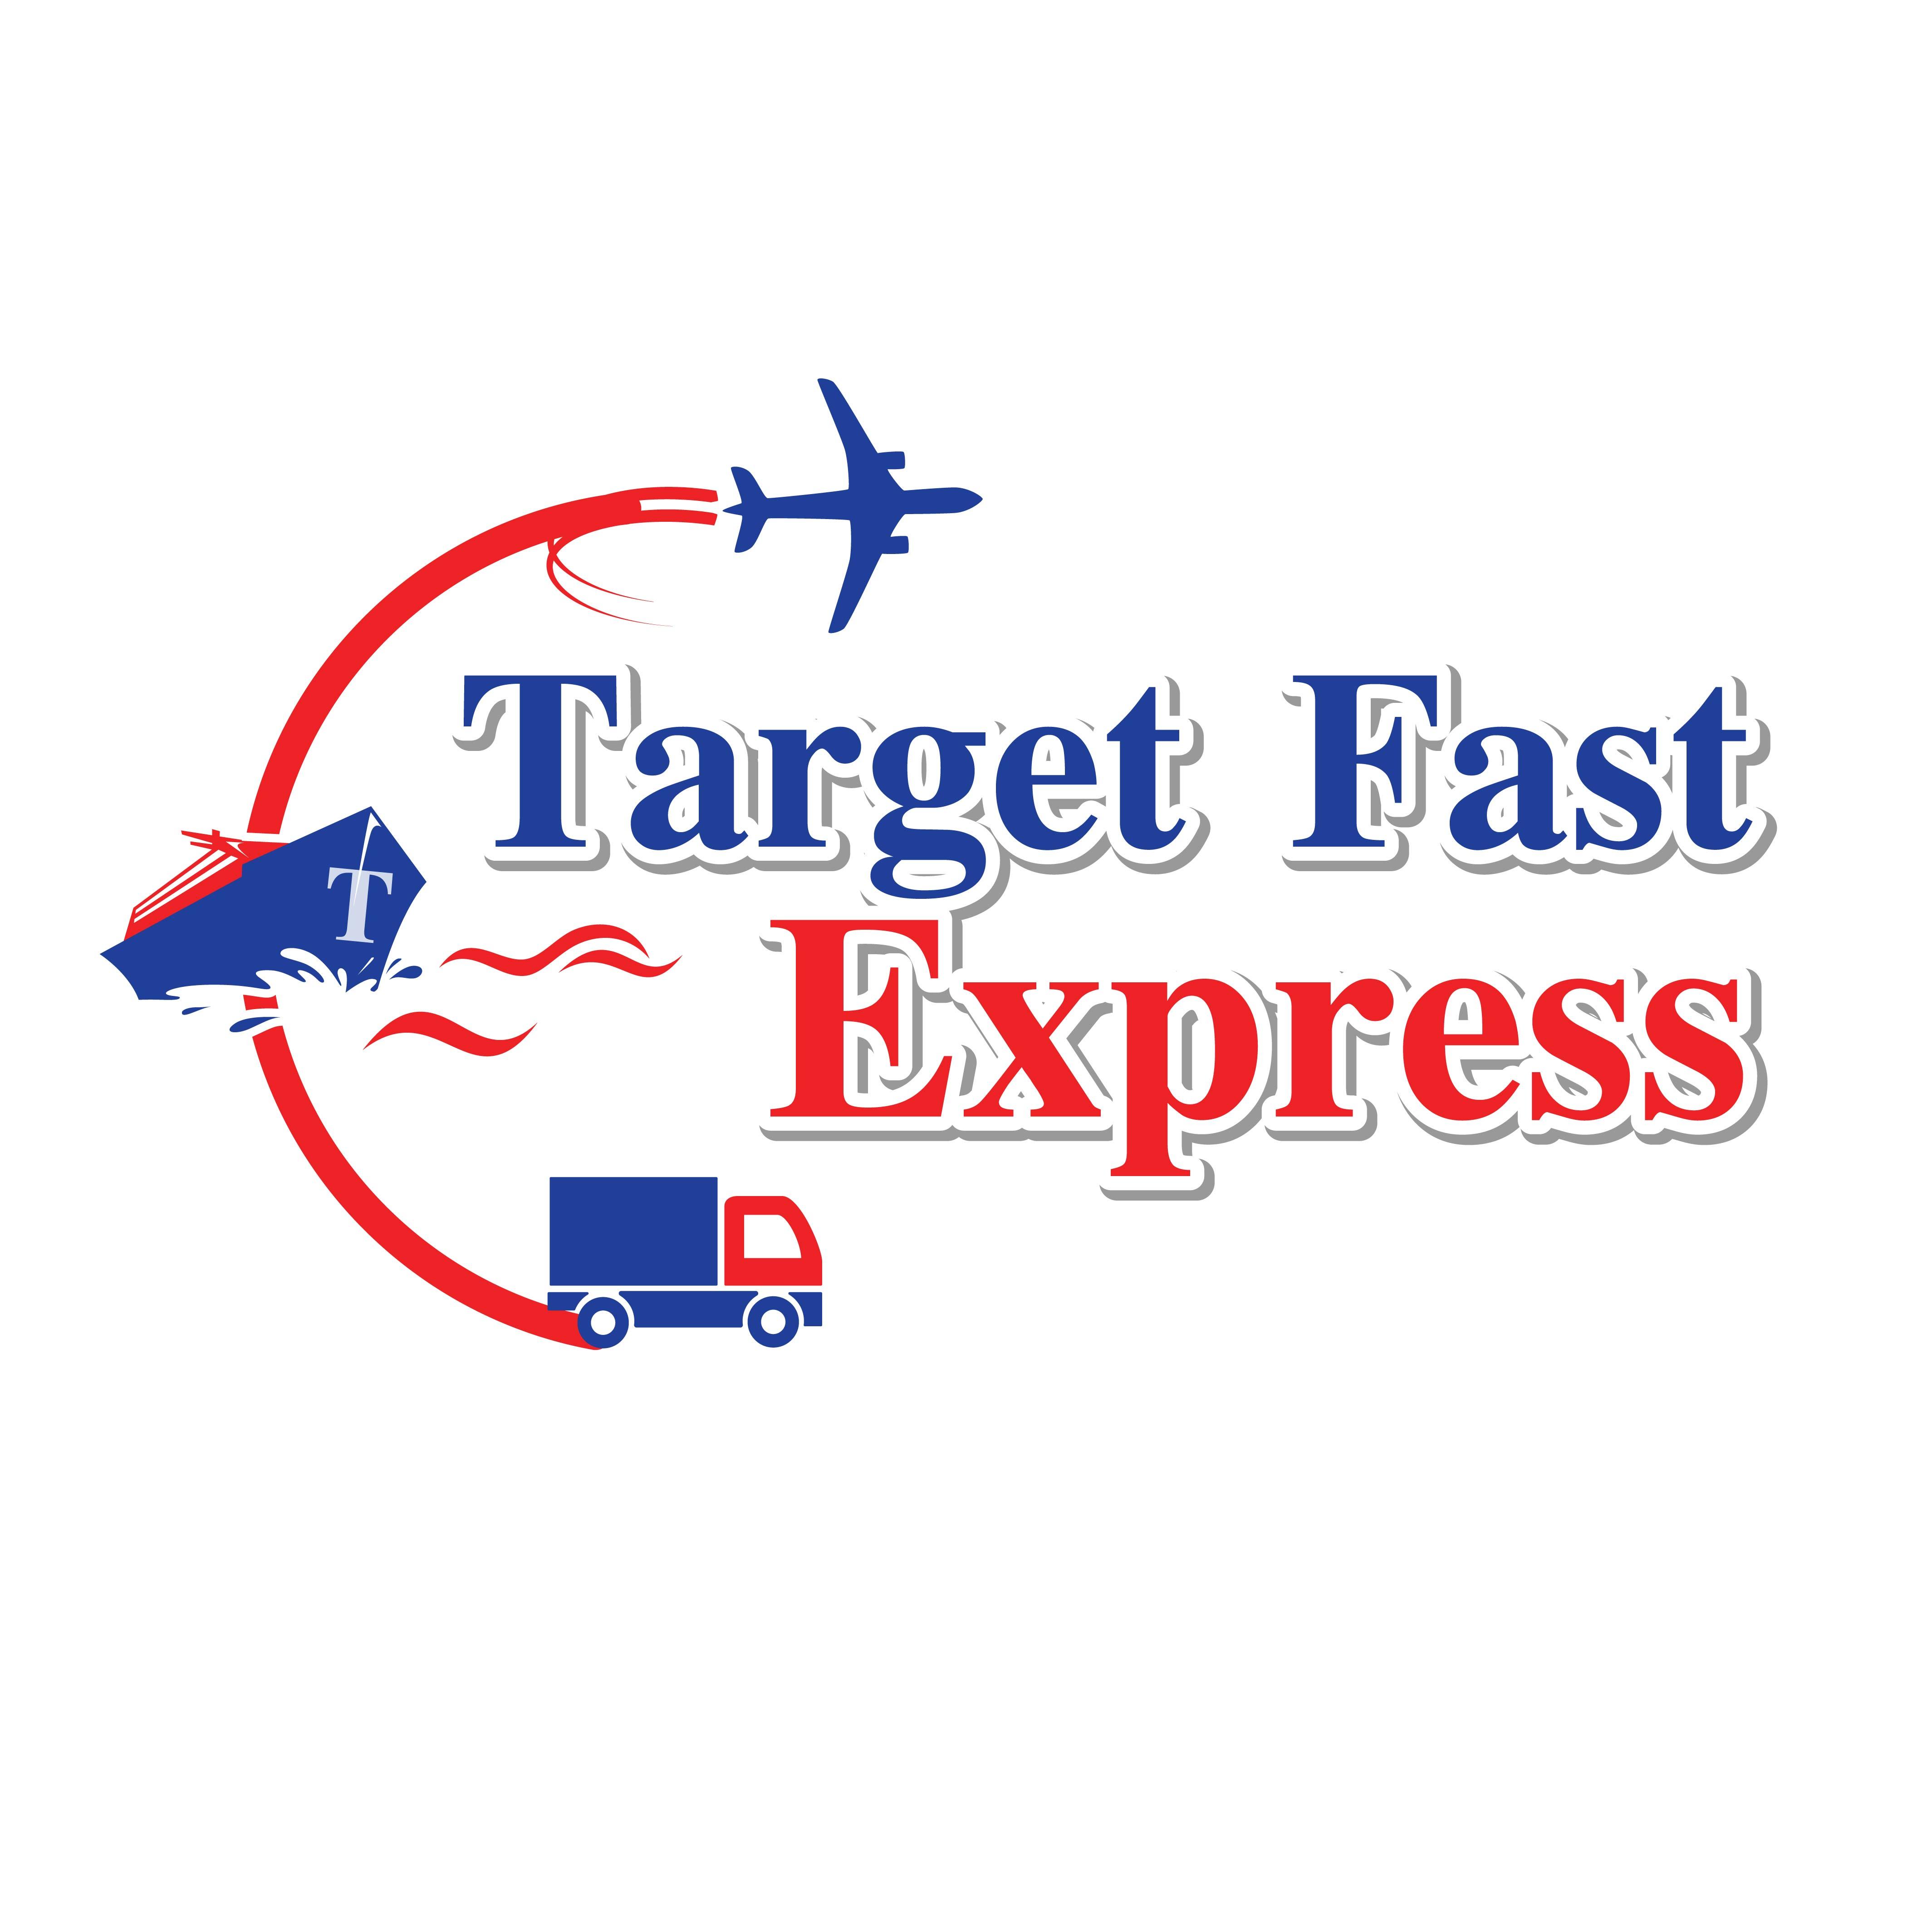 http://www.targetfastexpress.com/cargo